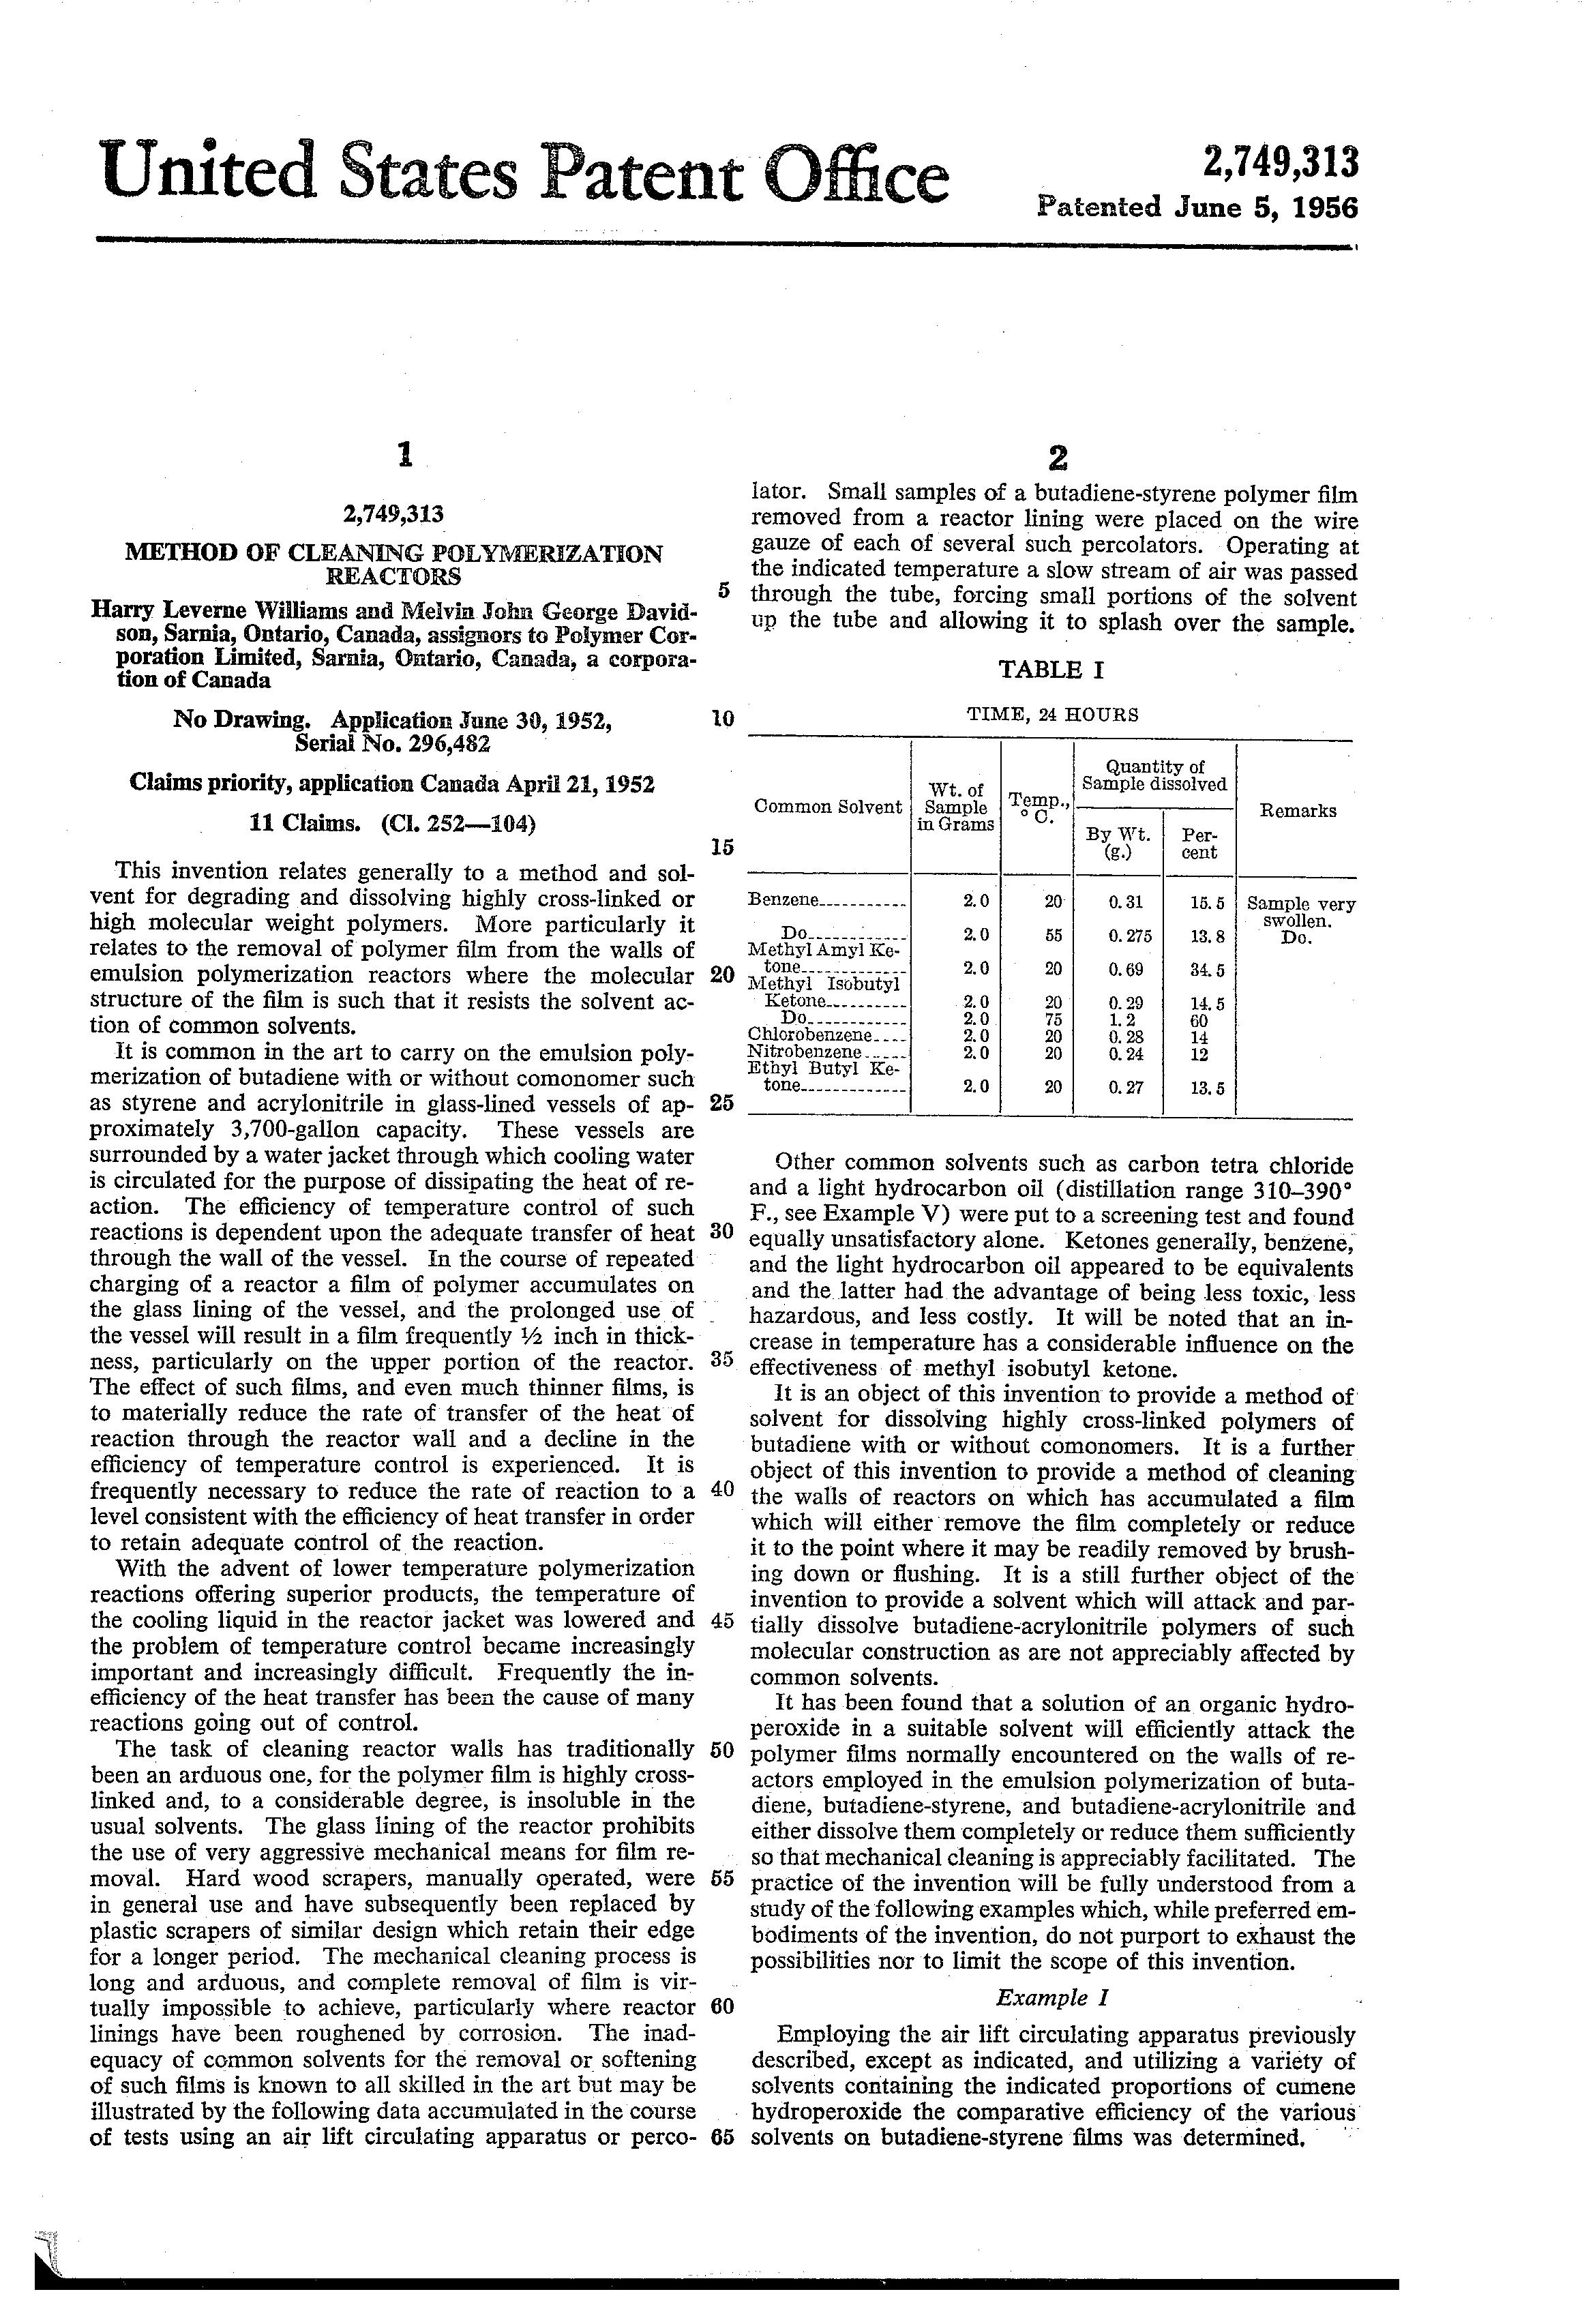 canadian patent application publication date